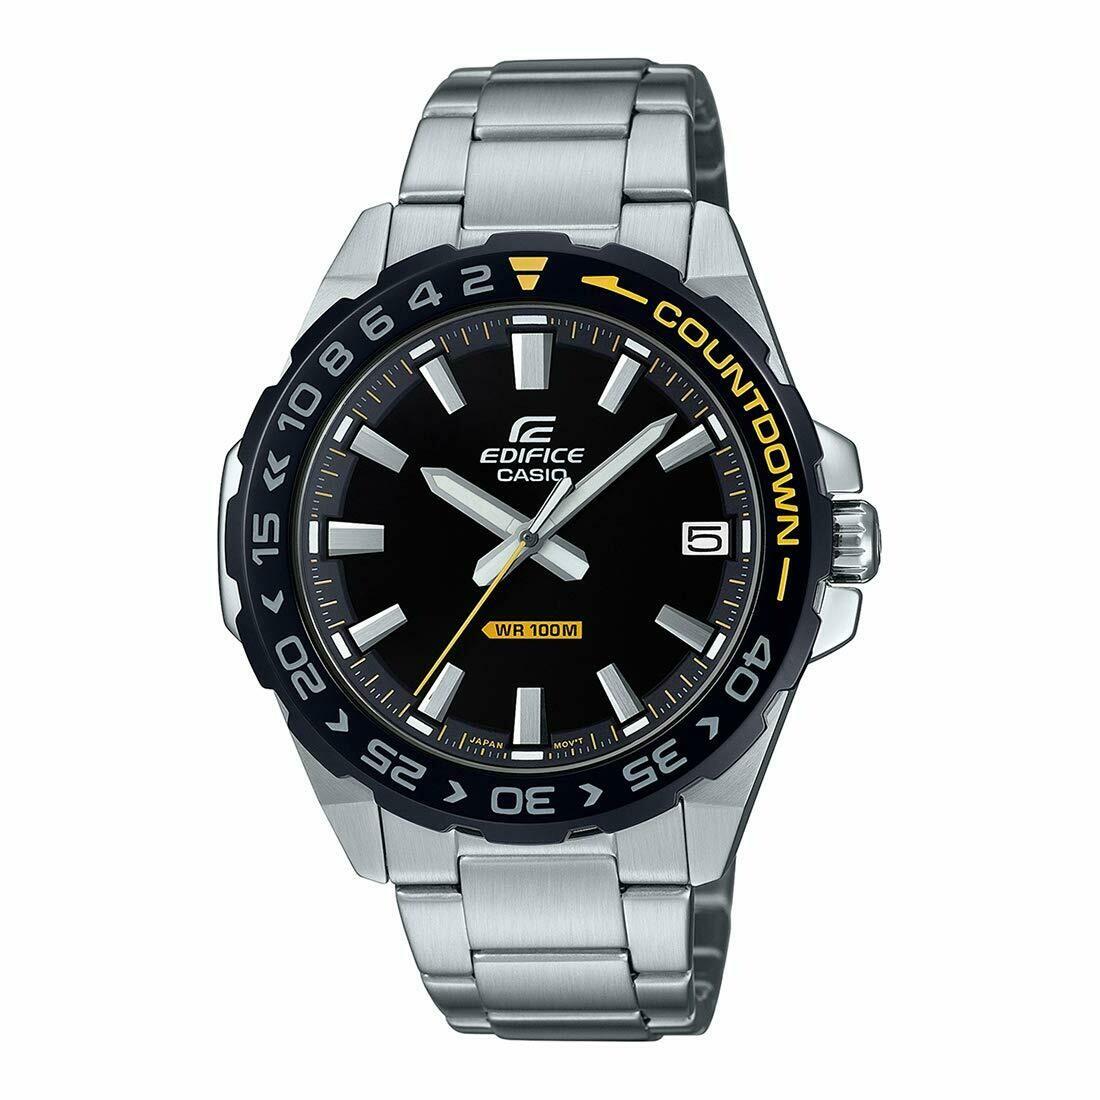 Casio Edifice EFV-120DB-1AVUDF Silver Metal Watch For Men